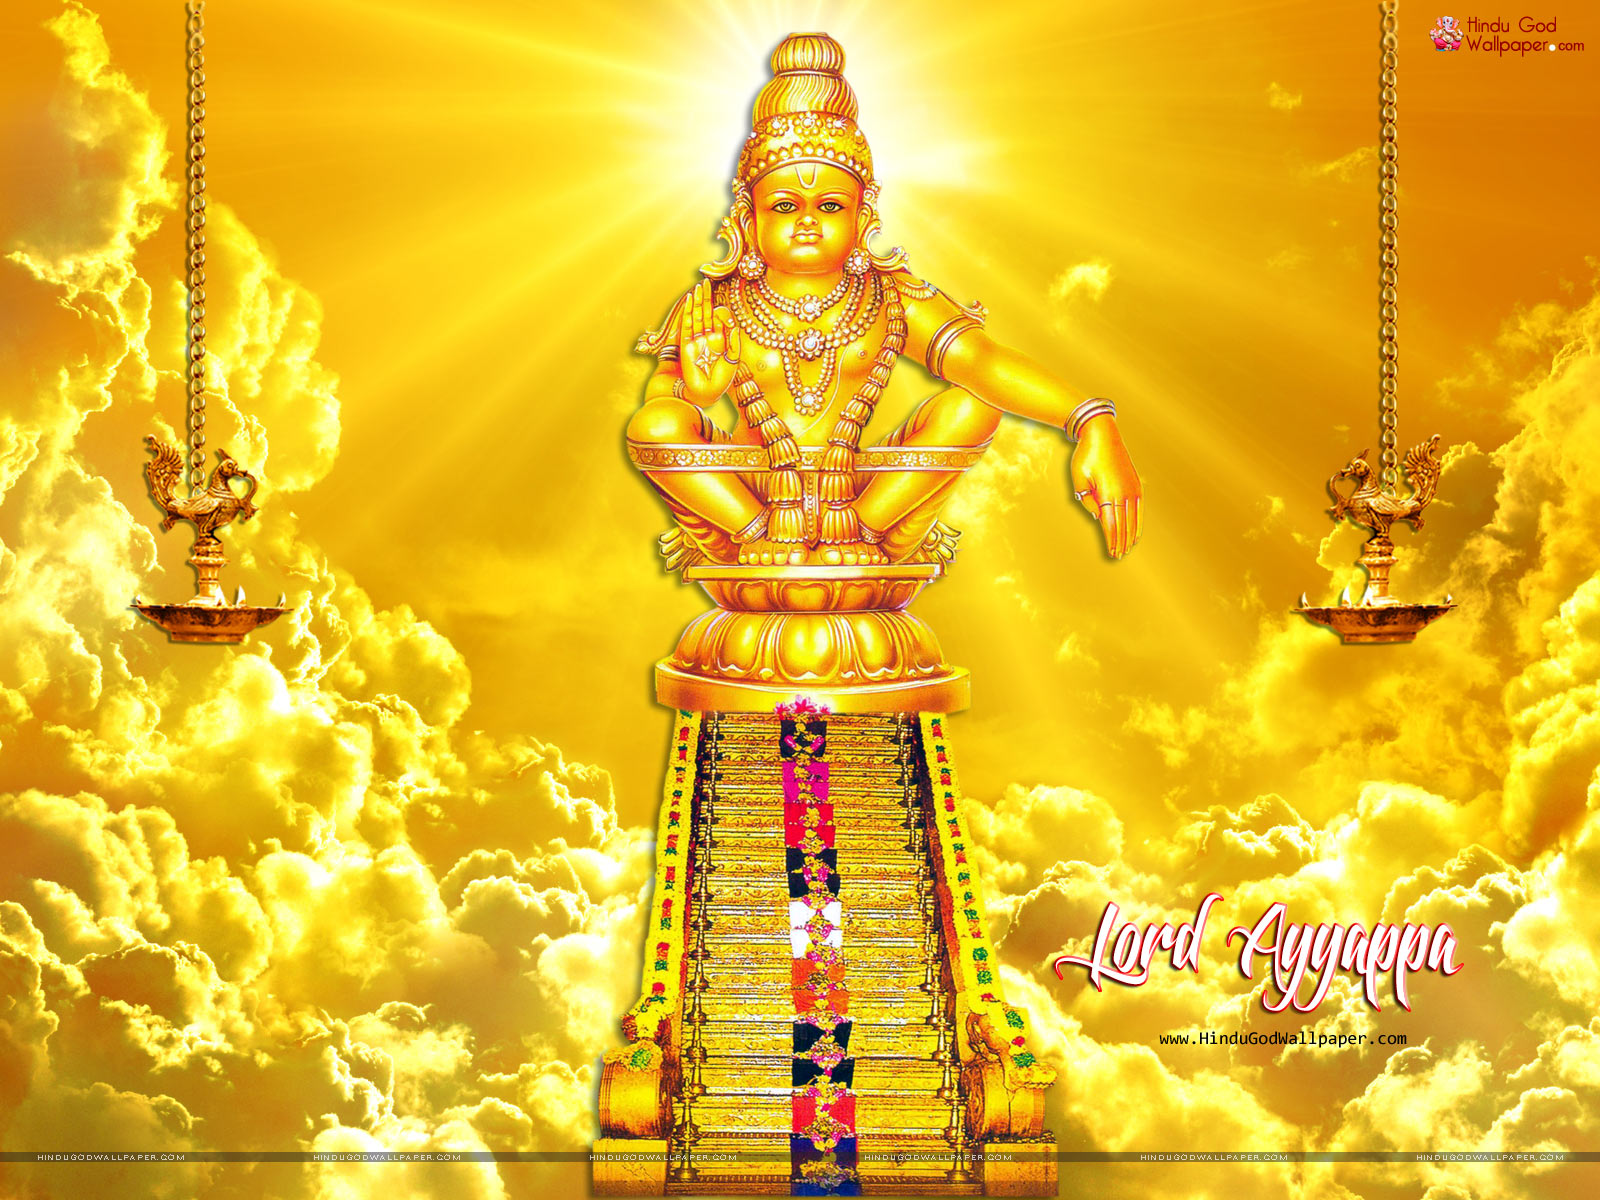 ayyappa 18 steps wallpaper free download ayyappa 18 steps wallpaper free download